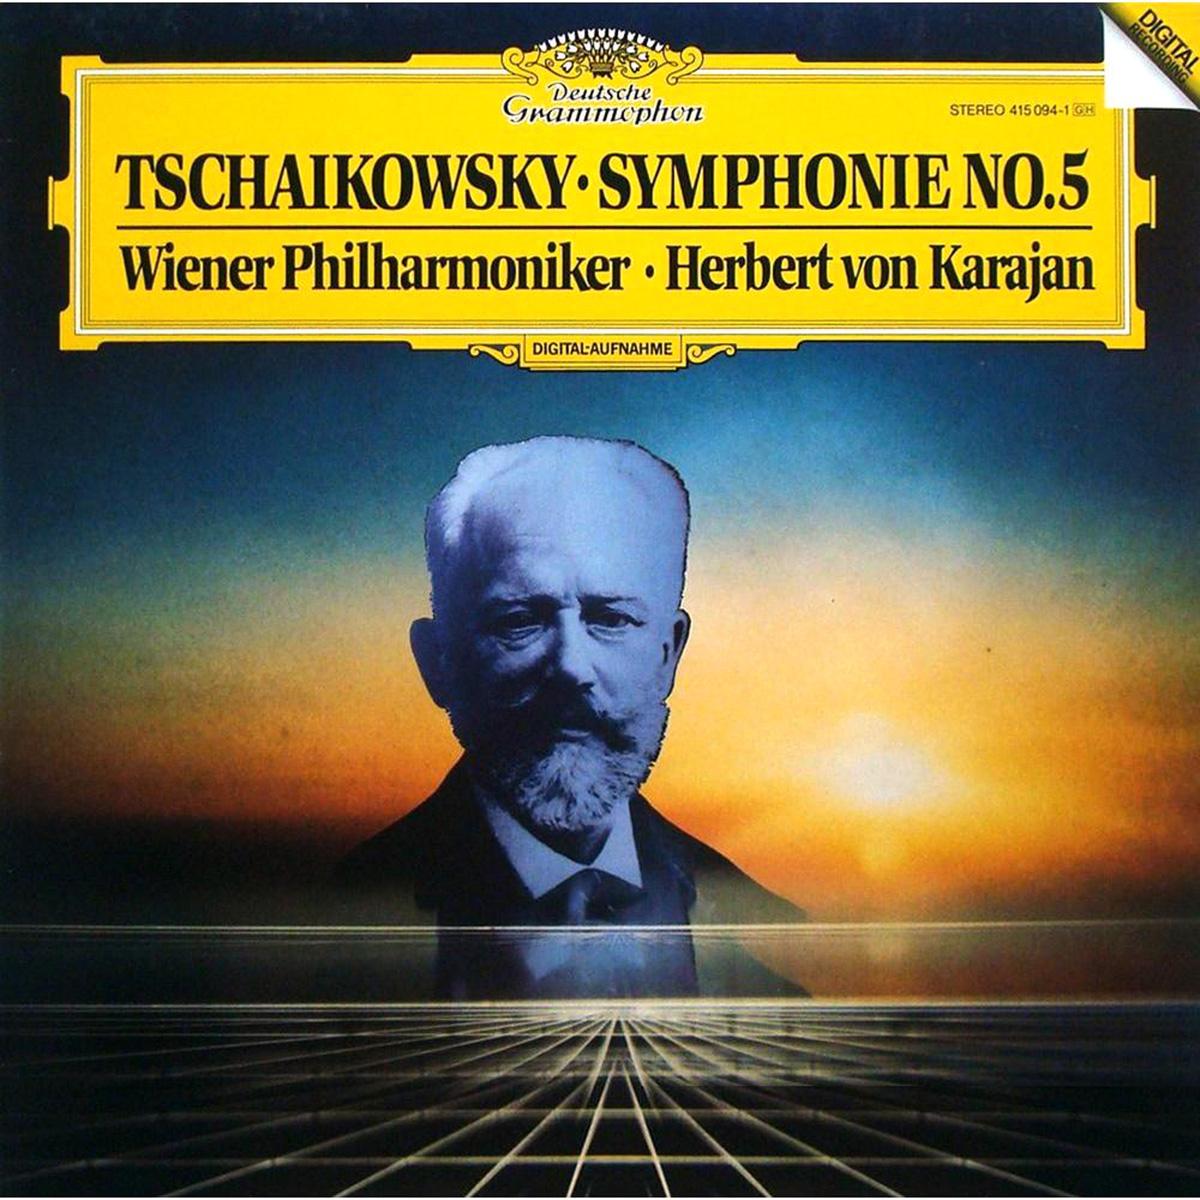 DGG 415095 Tchaikovsky Symphonie 6 Karajan DGG Digital Aufnahme